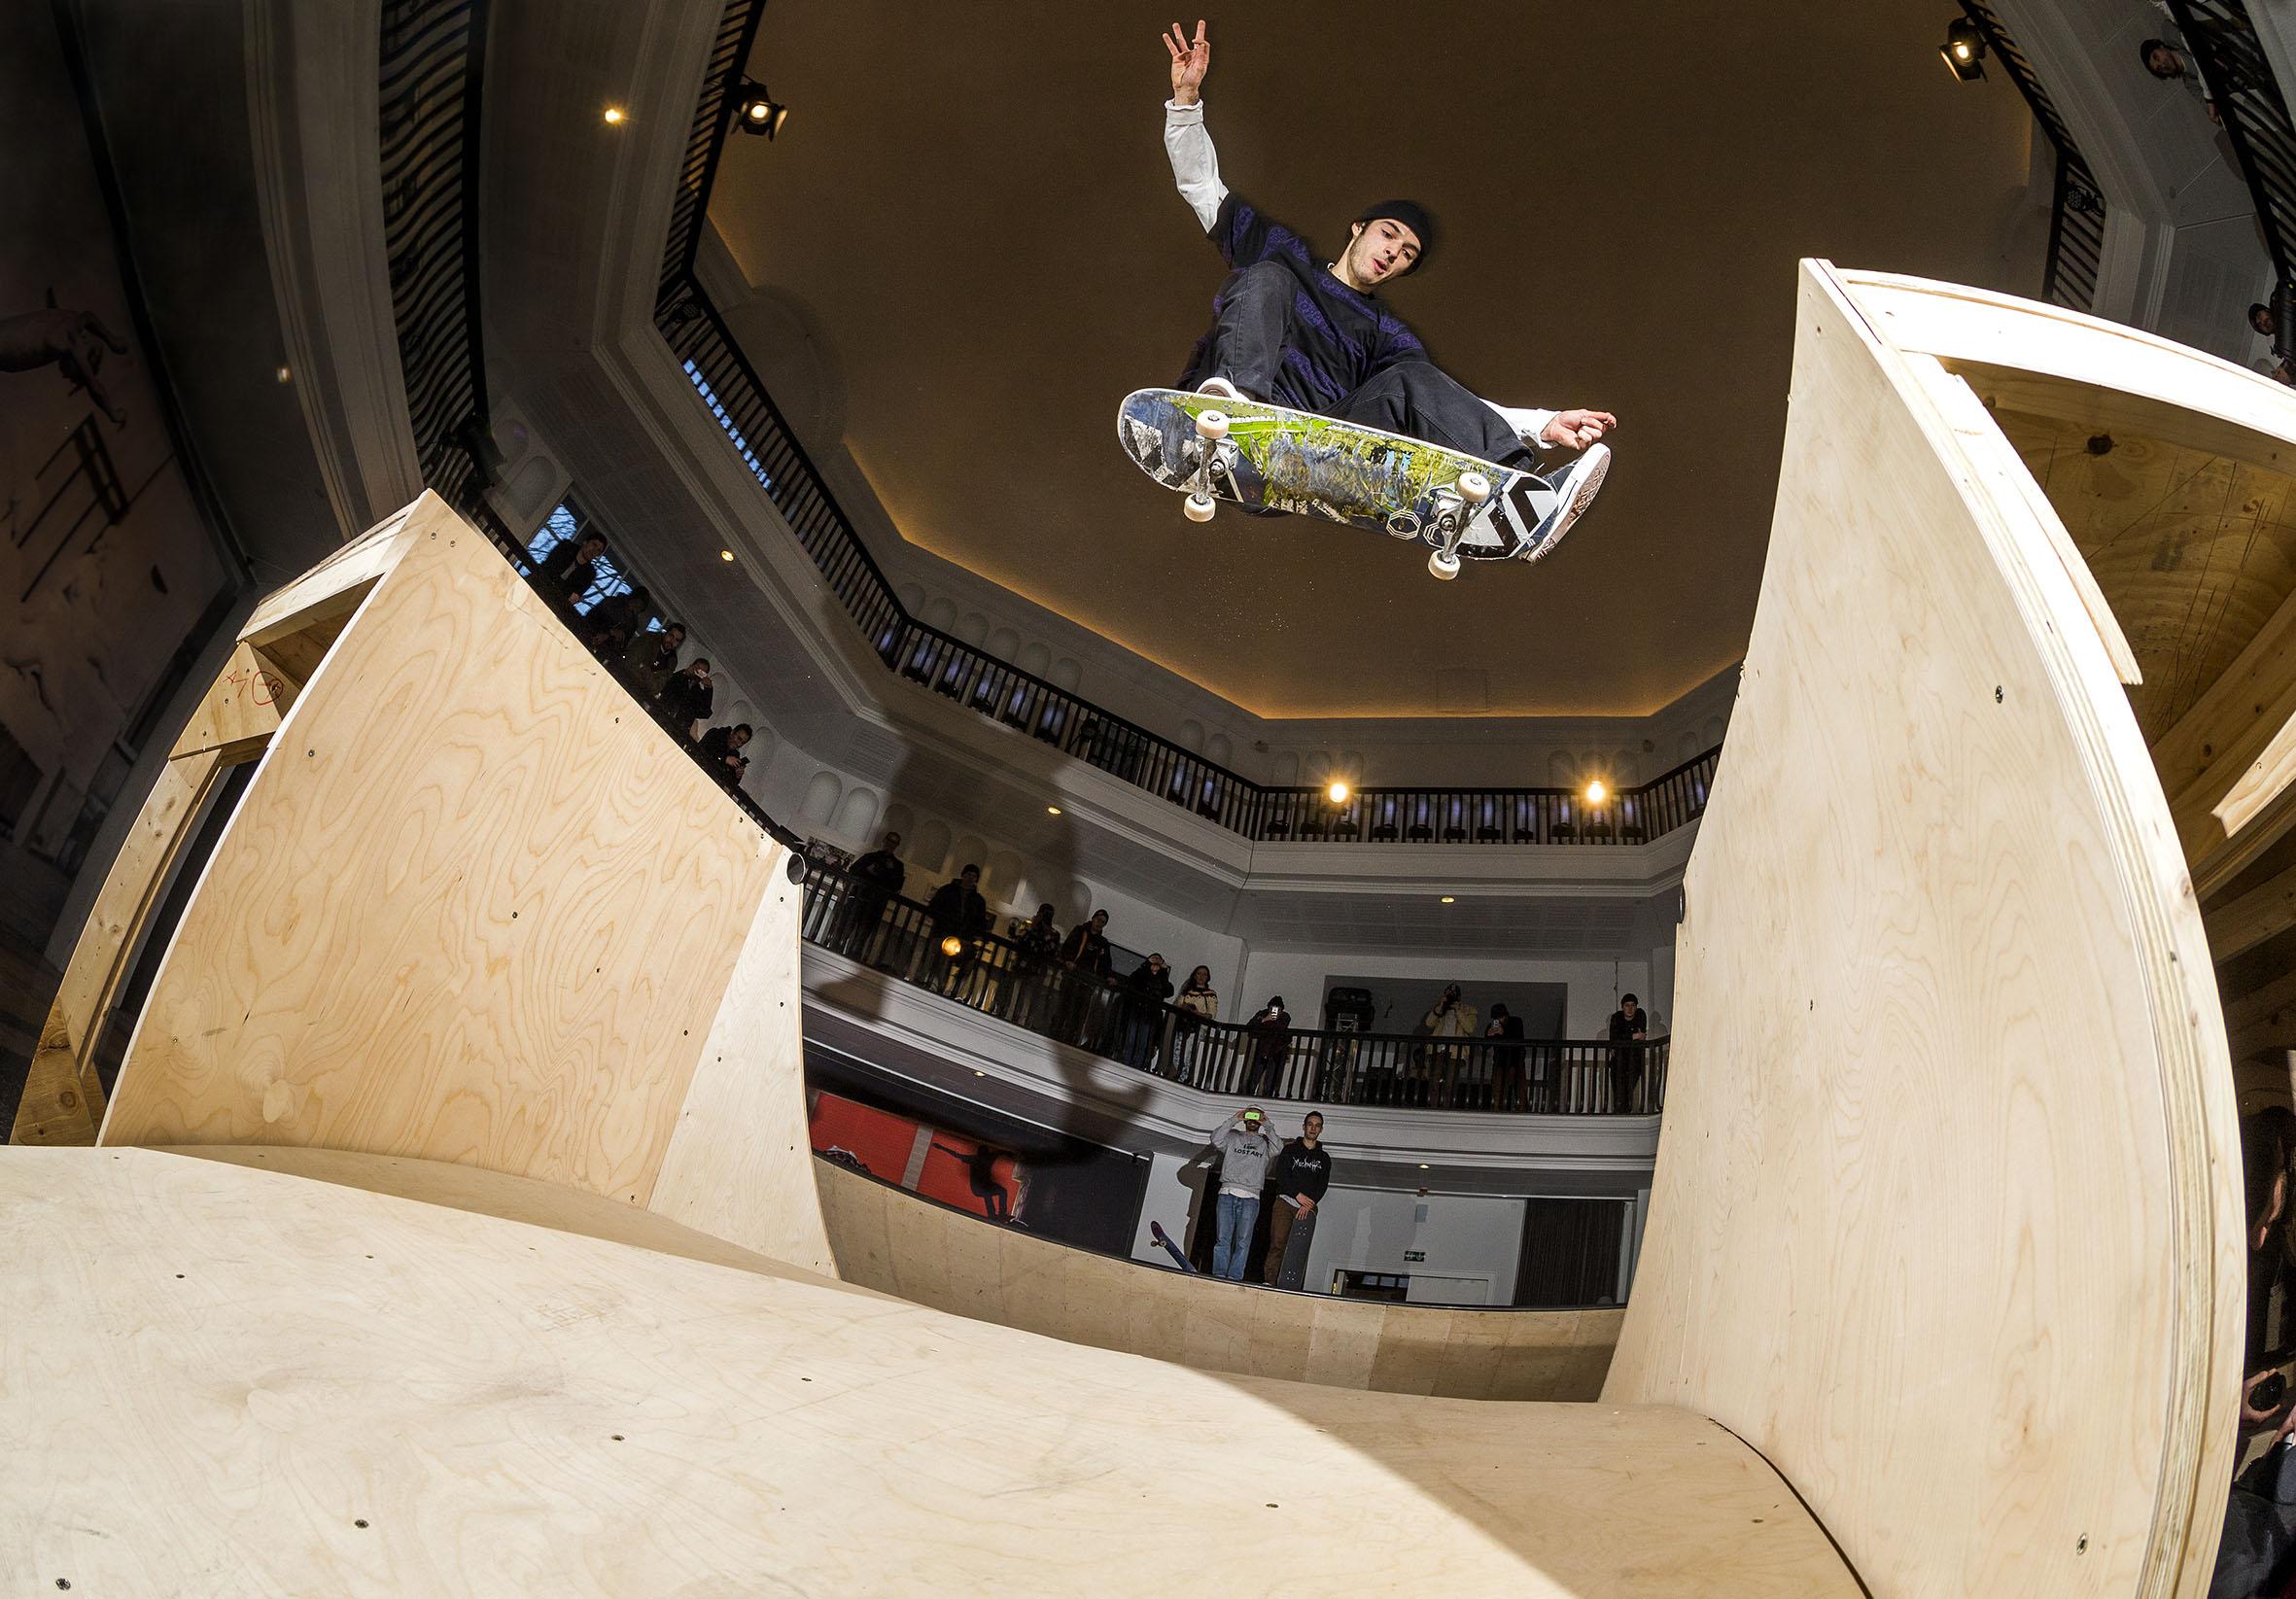 Remy Taveira | Kickflip Over the Gap